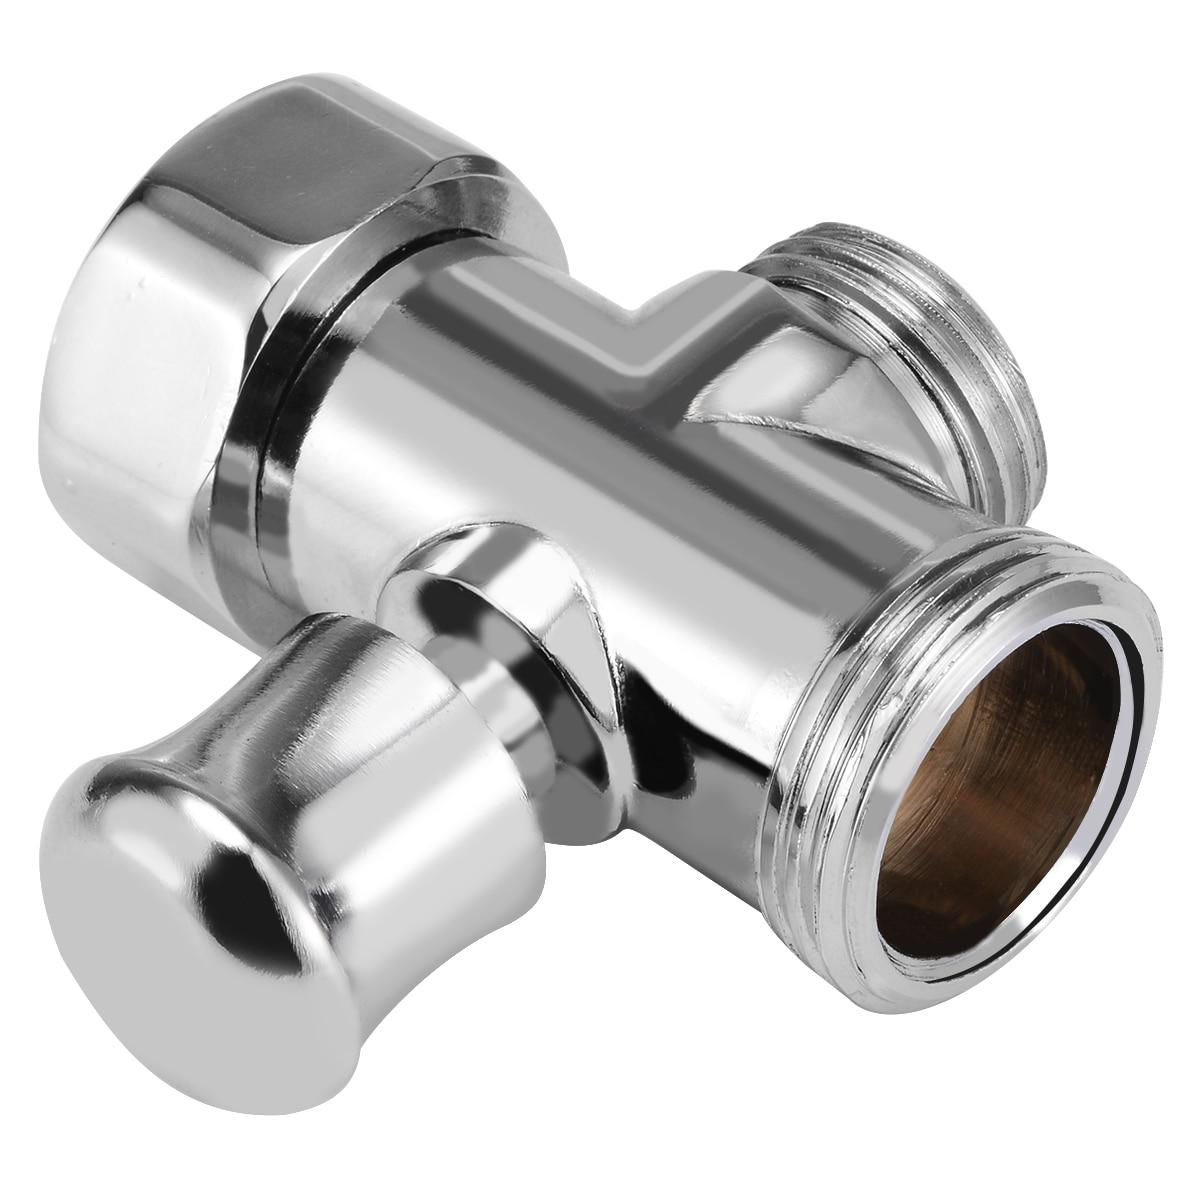 3 Way Bathroom Toilet Bidet 3/4'' & 1/2'' BSP T-adapter Shower Diverter Valve Shower Head For Toilet Bidet Shower Bathroom Tool